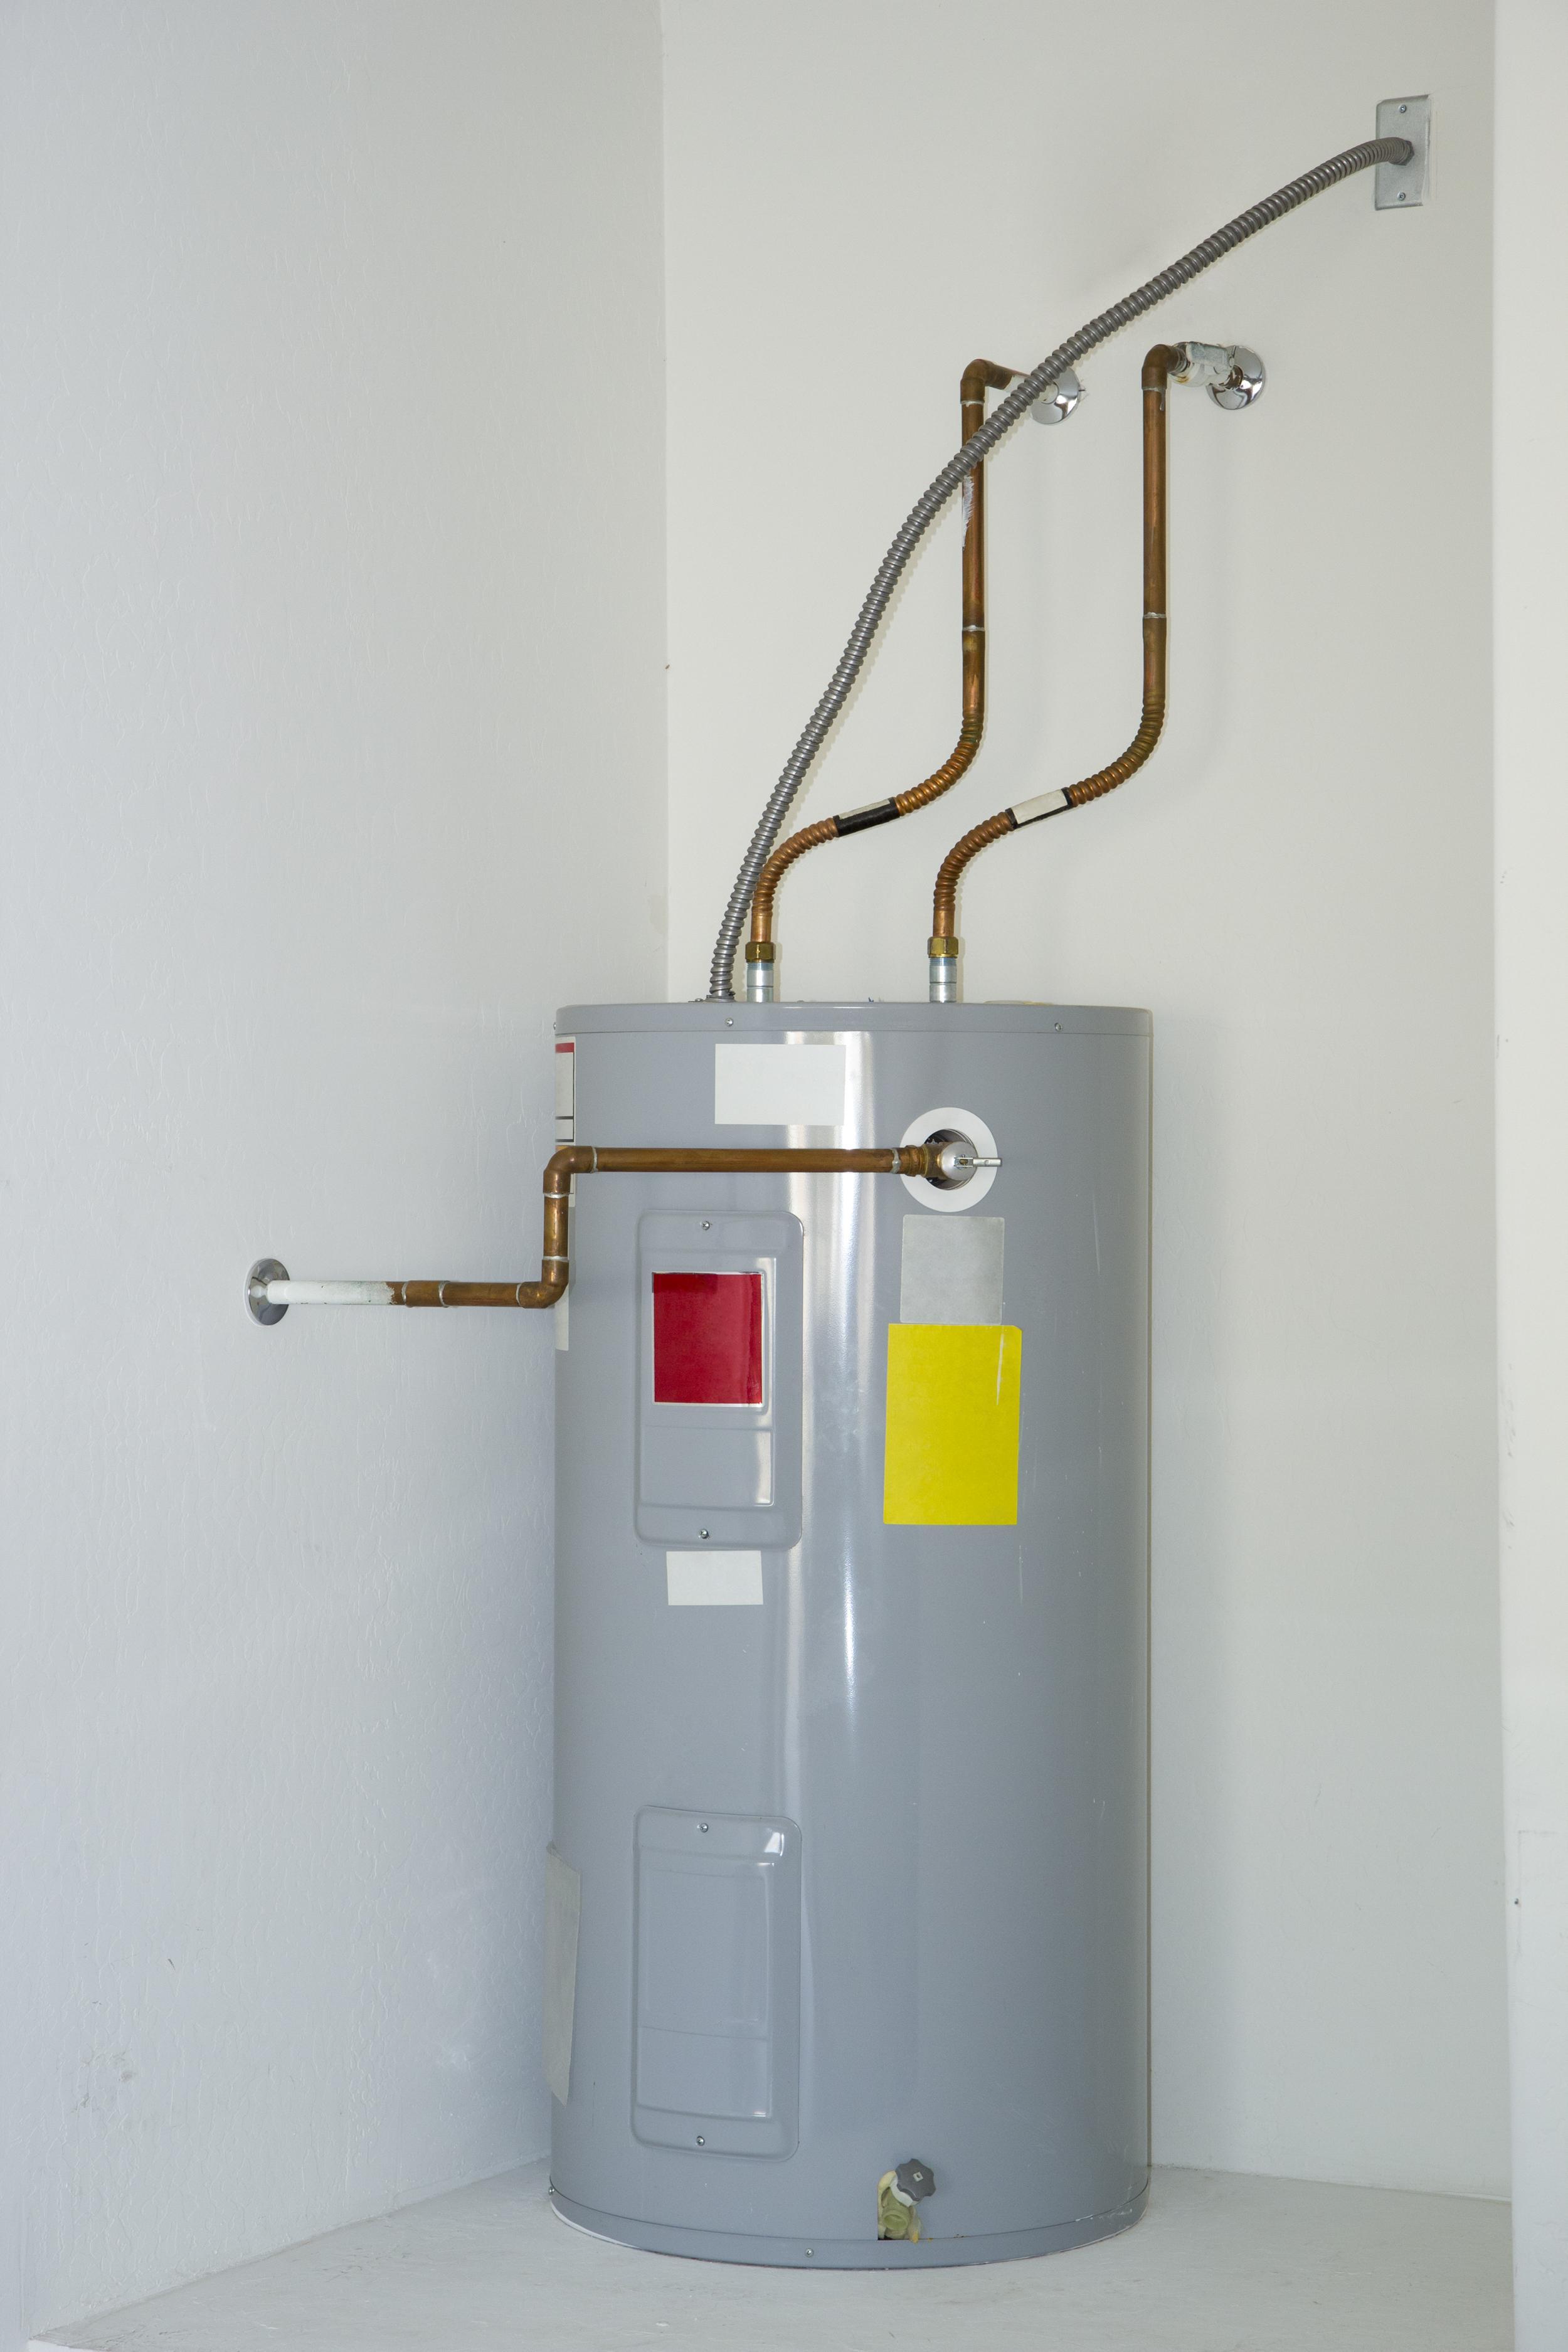 wiring diagram rheem water heaters ray may plumbing montclair ca plumbing contractors  ray may plumbing montclair ca plumbing contractors